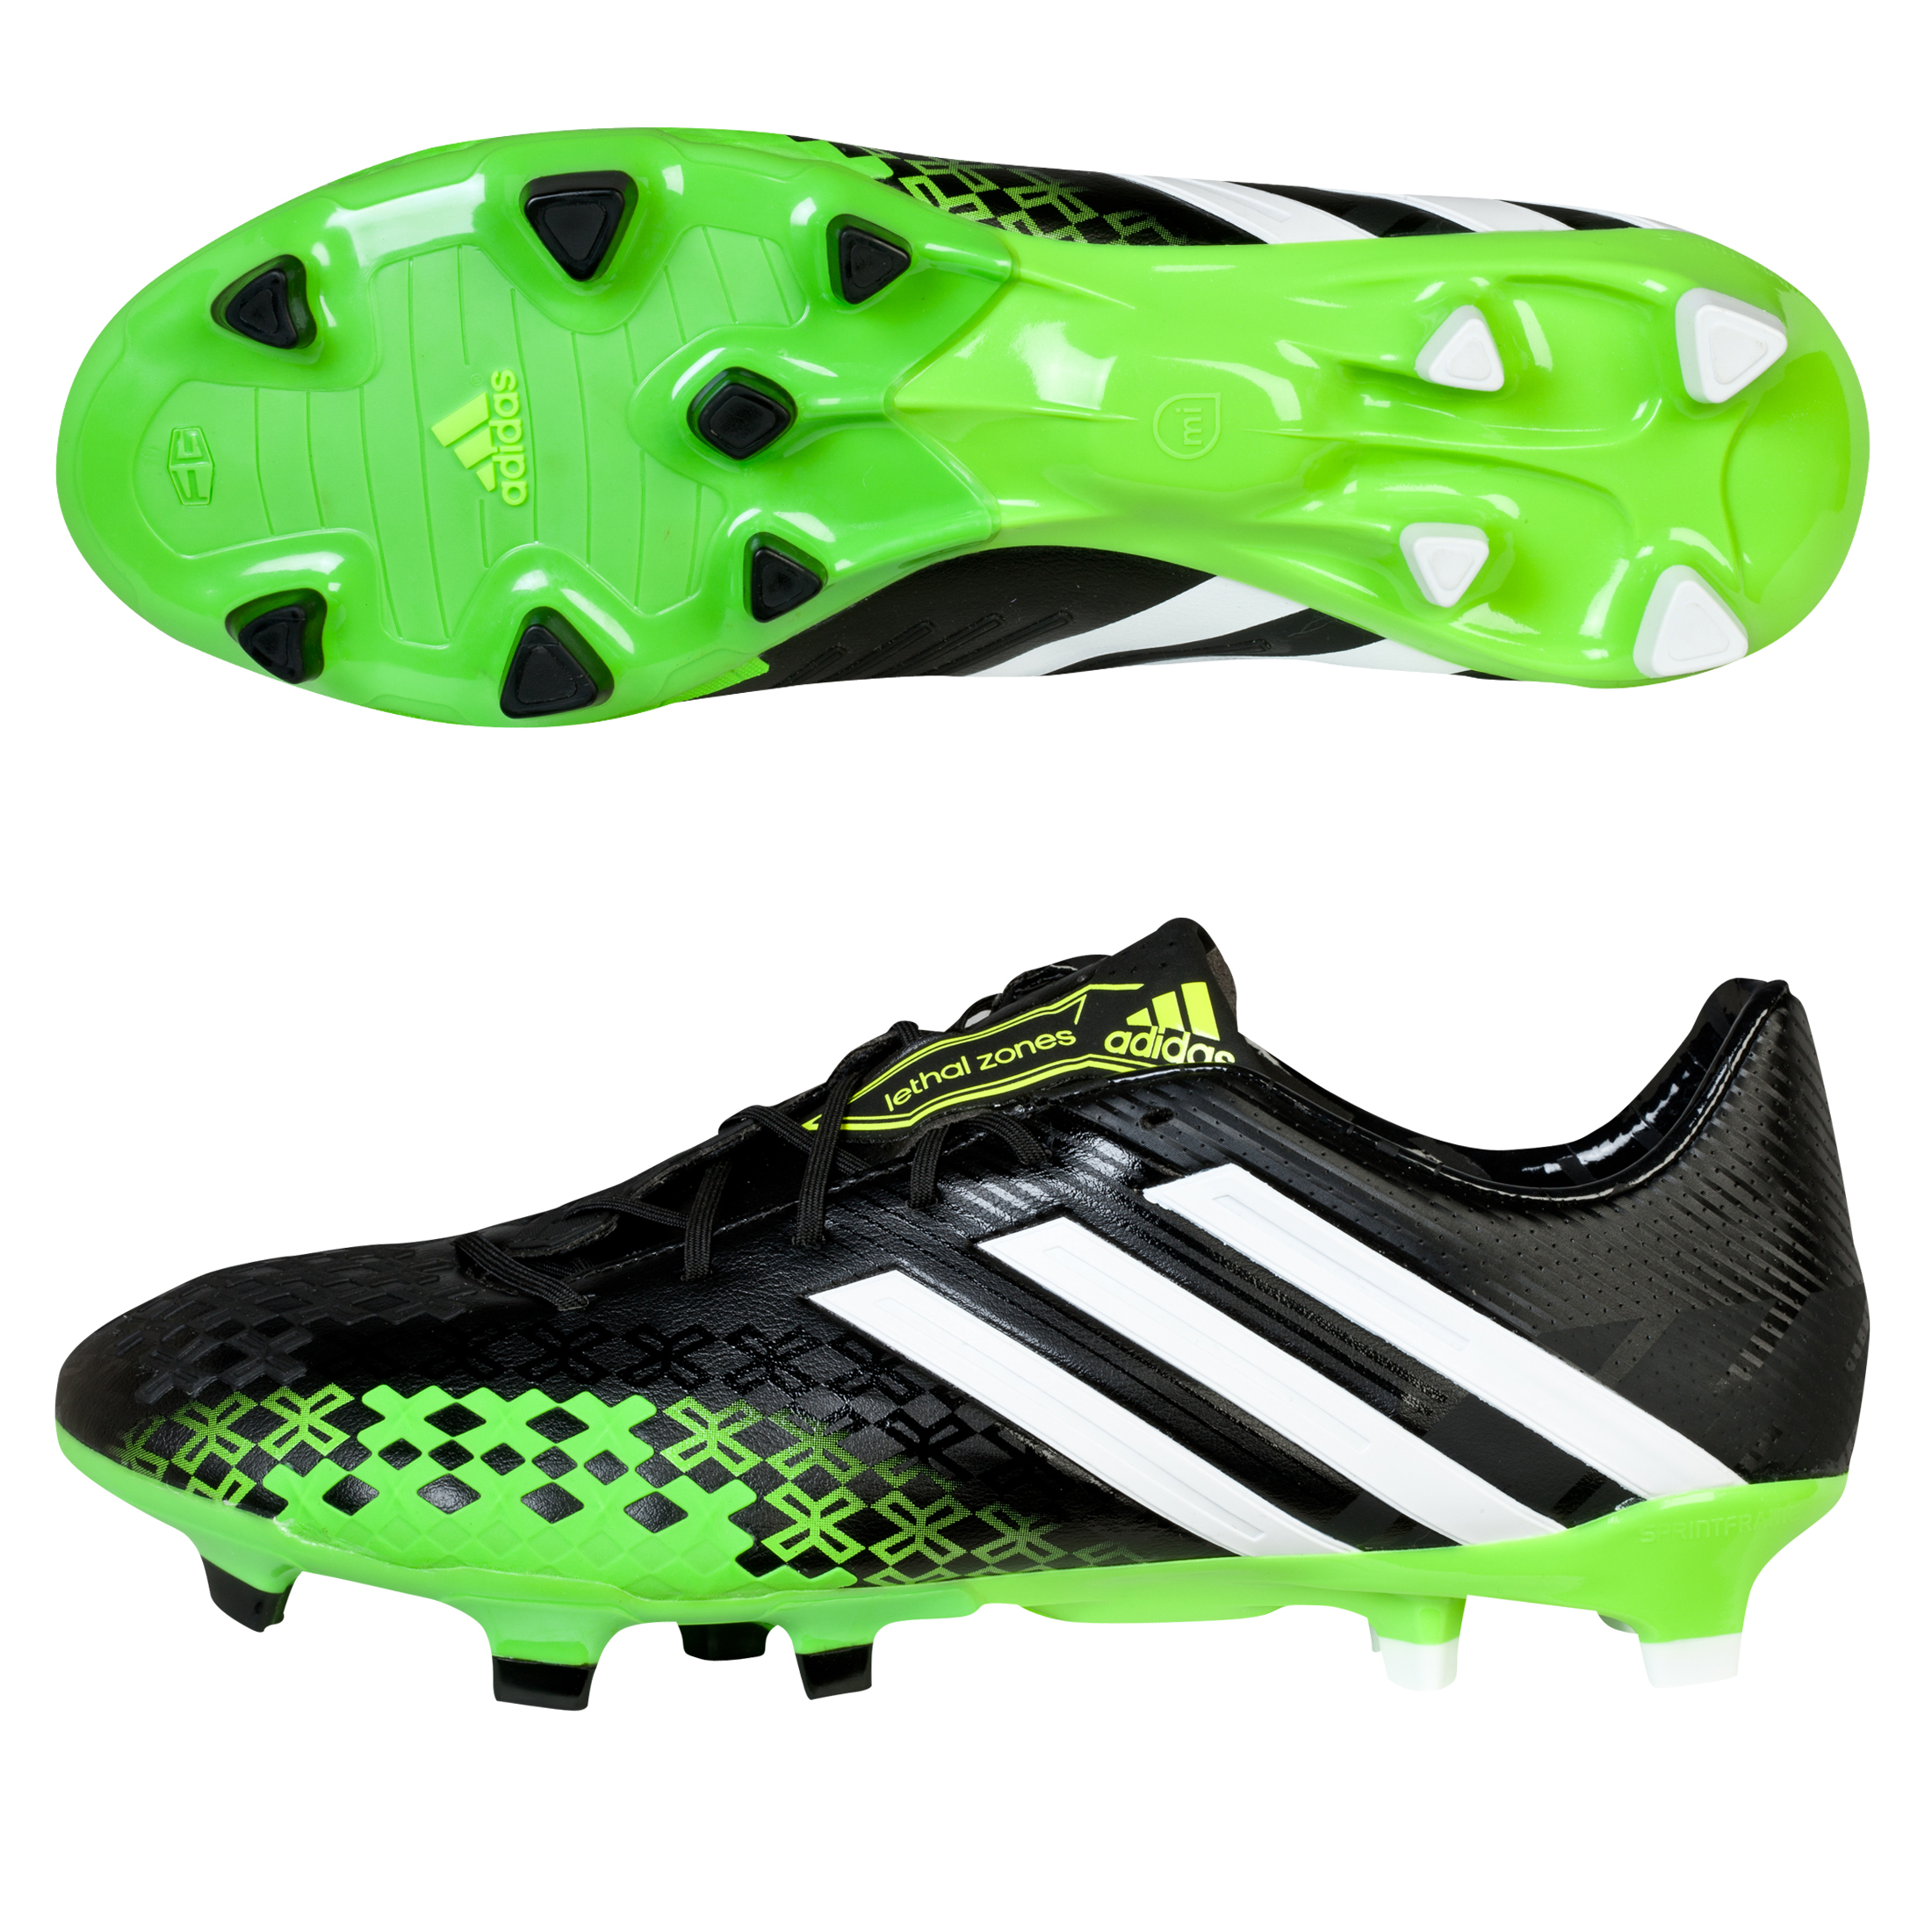 Adidas Predator LZ TRX Firm Ground Football Boots Black